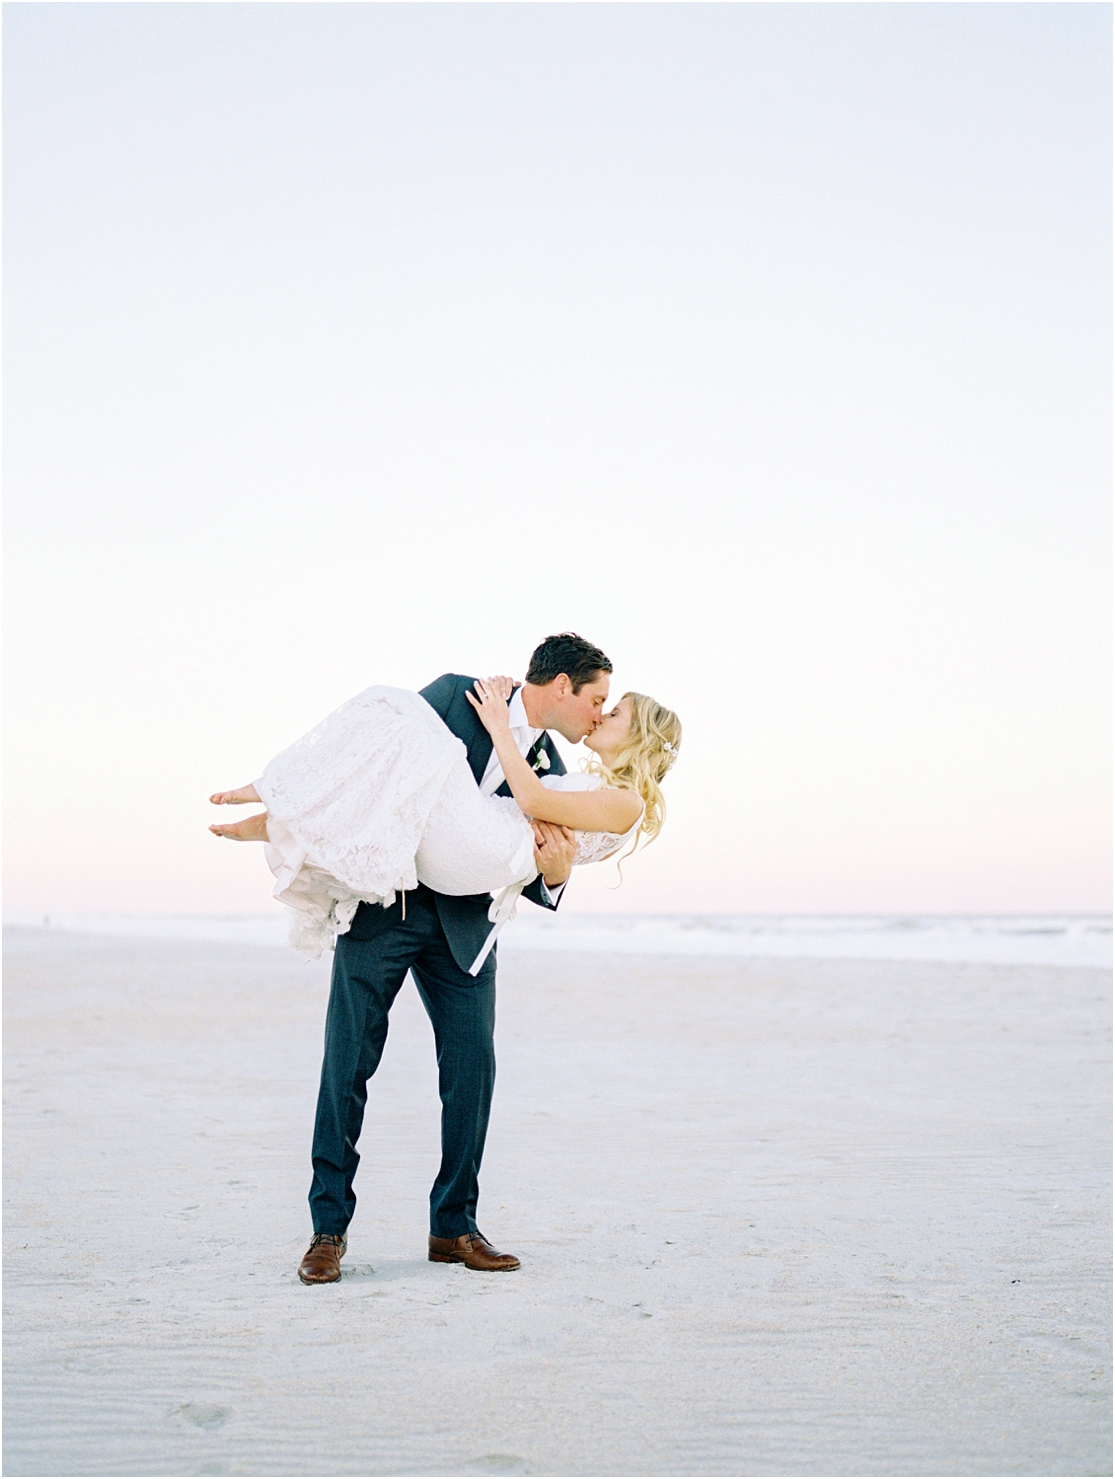 Lisa Silva Photography- Ponte Vedra Beach and Jacksonville, Florida Fine Art Film Wedding Photography- Wedding at the Ponte Vedra Inn and Club_0067.jpg